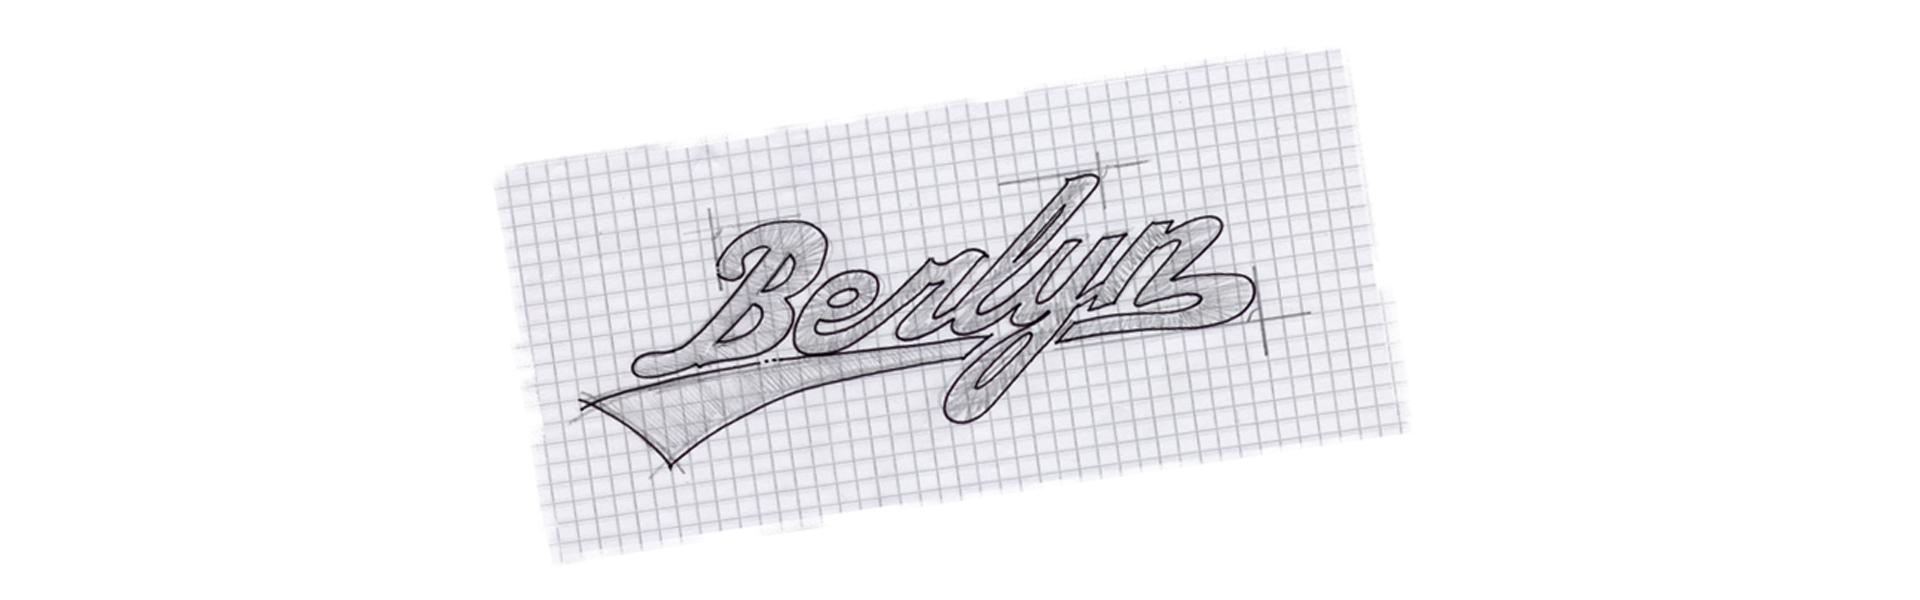 BerlynScribble_1920x600